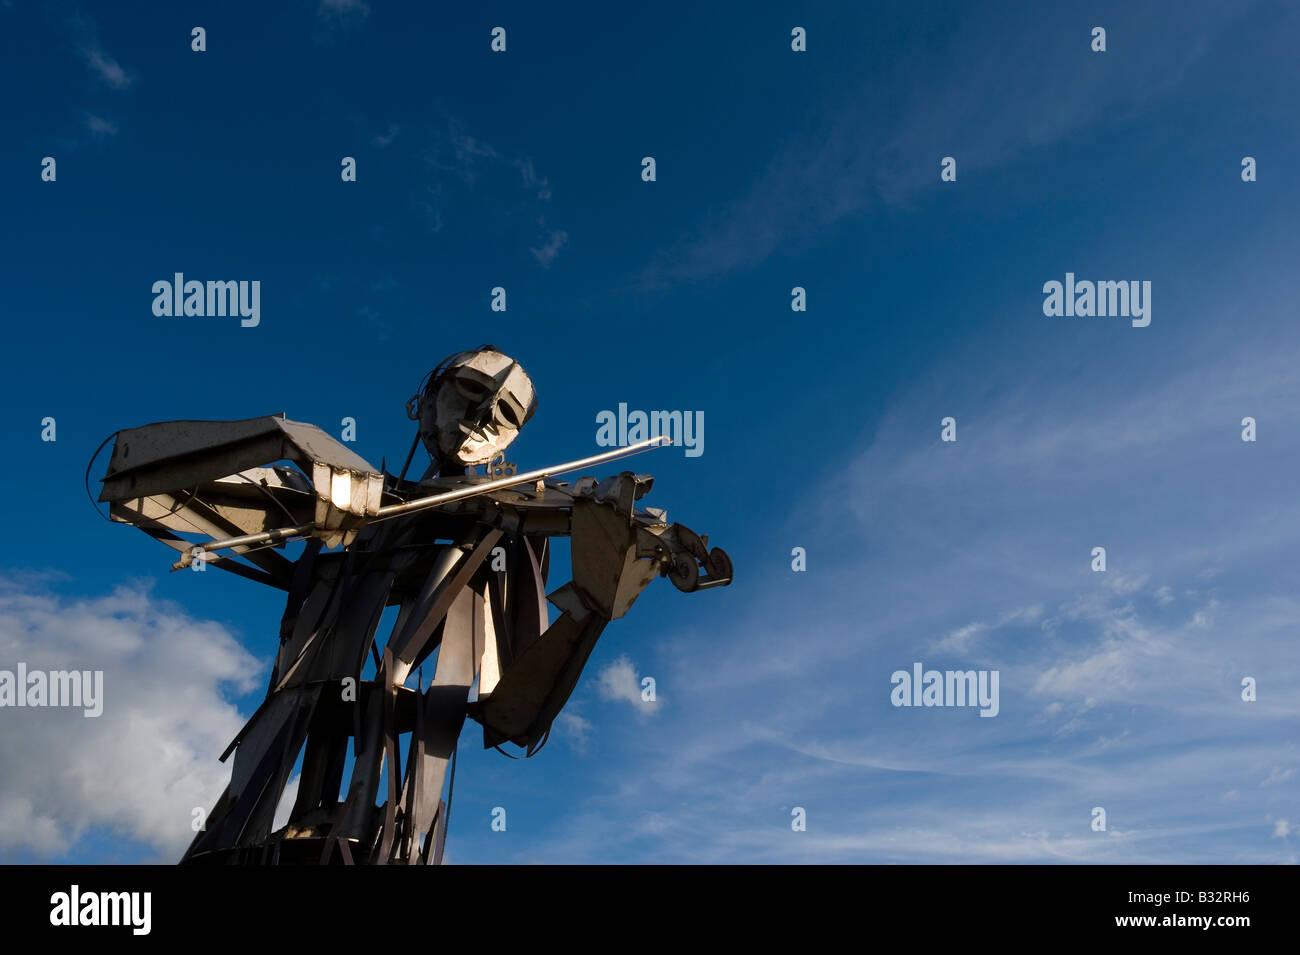 Let The Dance Begin Sculpture Strabane Derry Northern Ireland - Stock Image